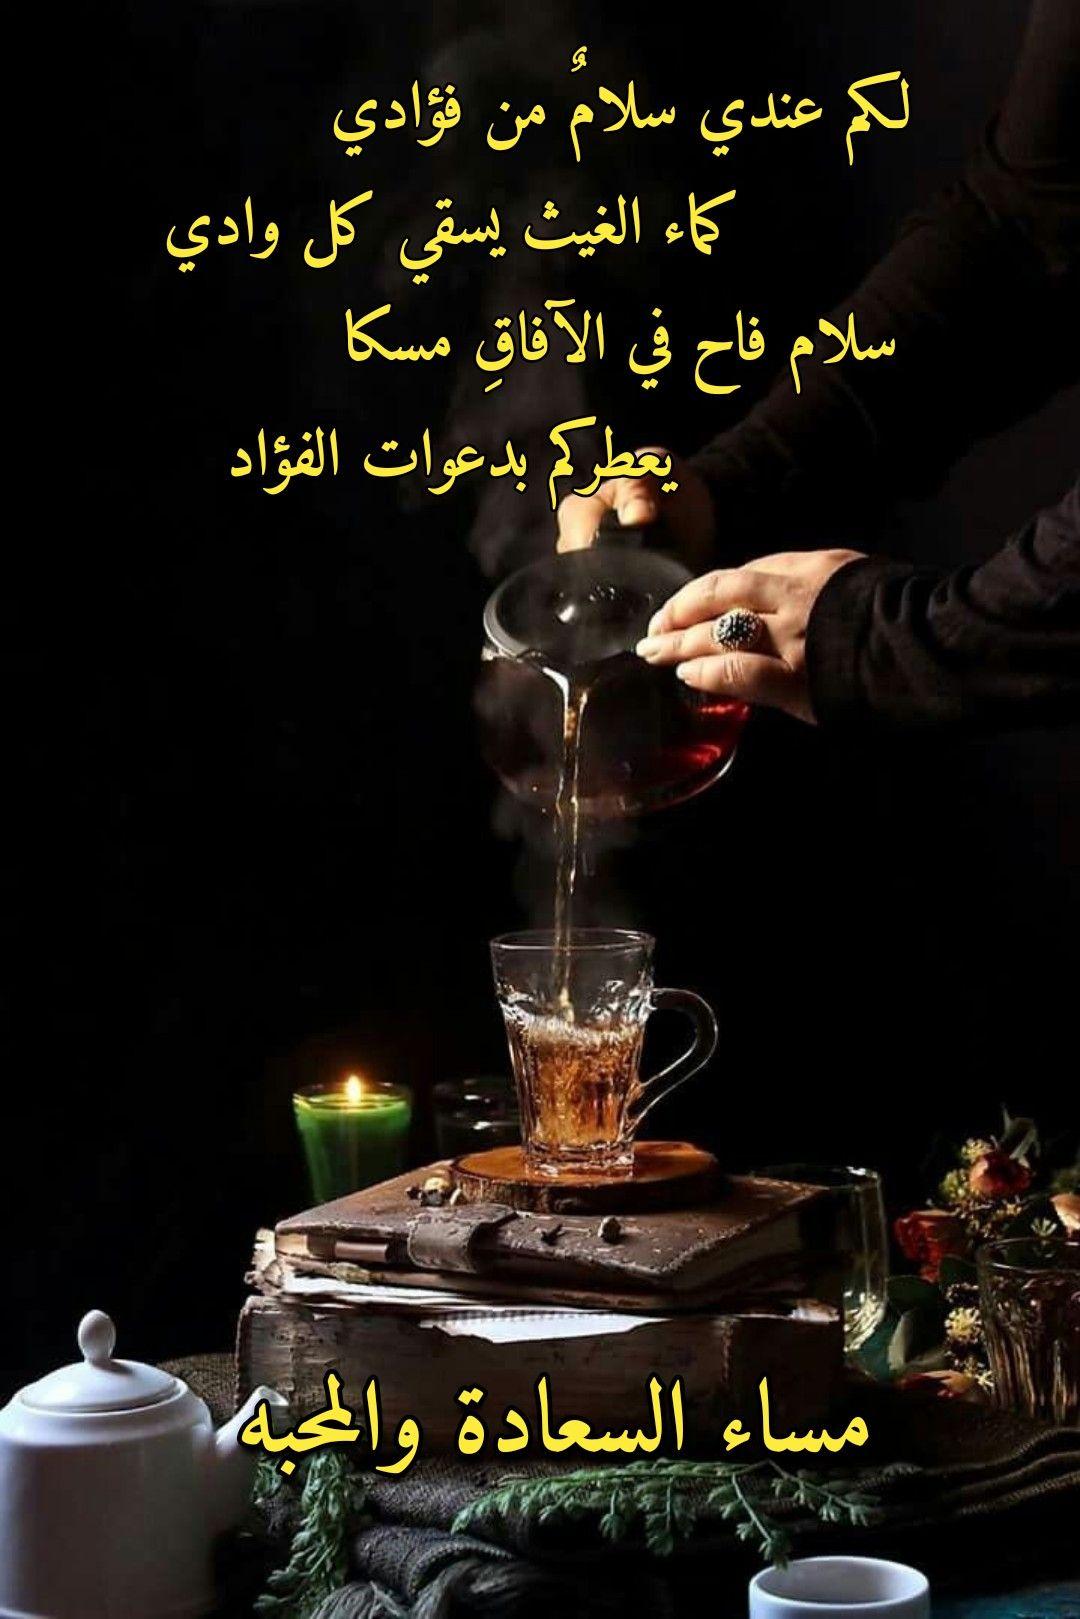 Pin By Mohammed Haji On Mdhaji Romantic Love Quotes Romantic Love Romantic